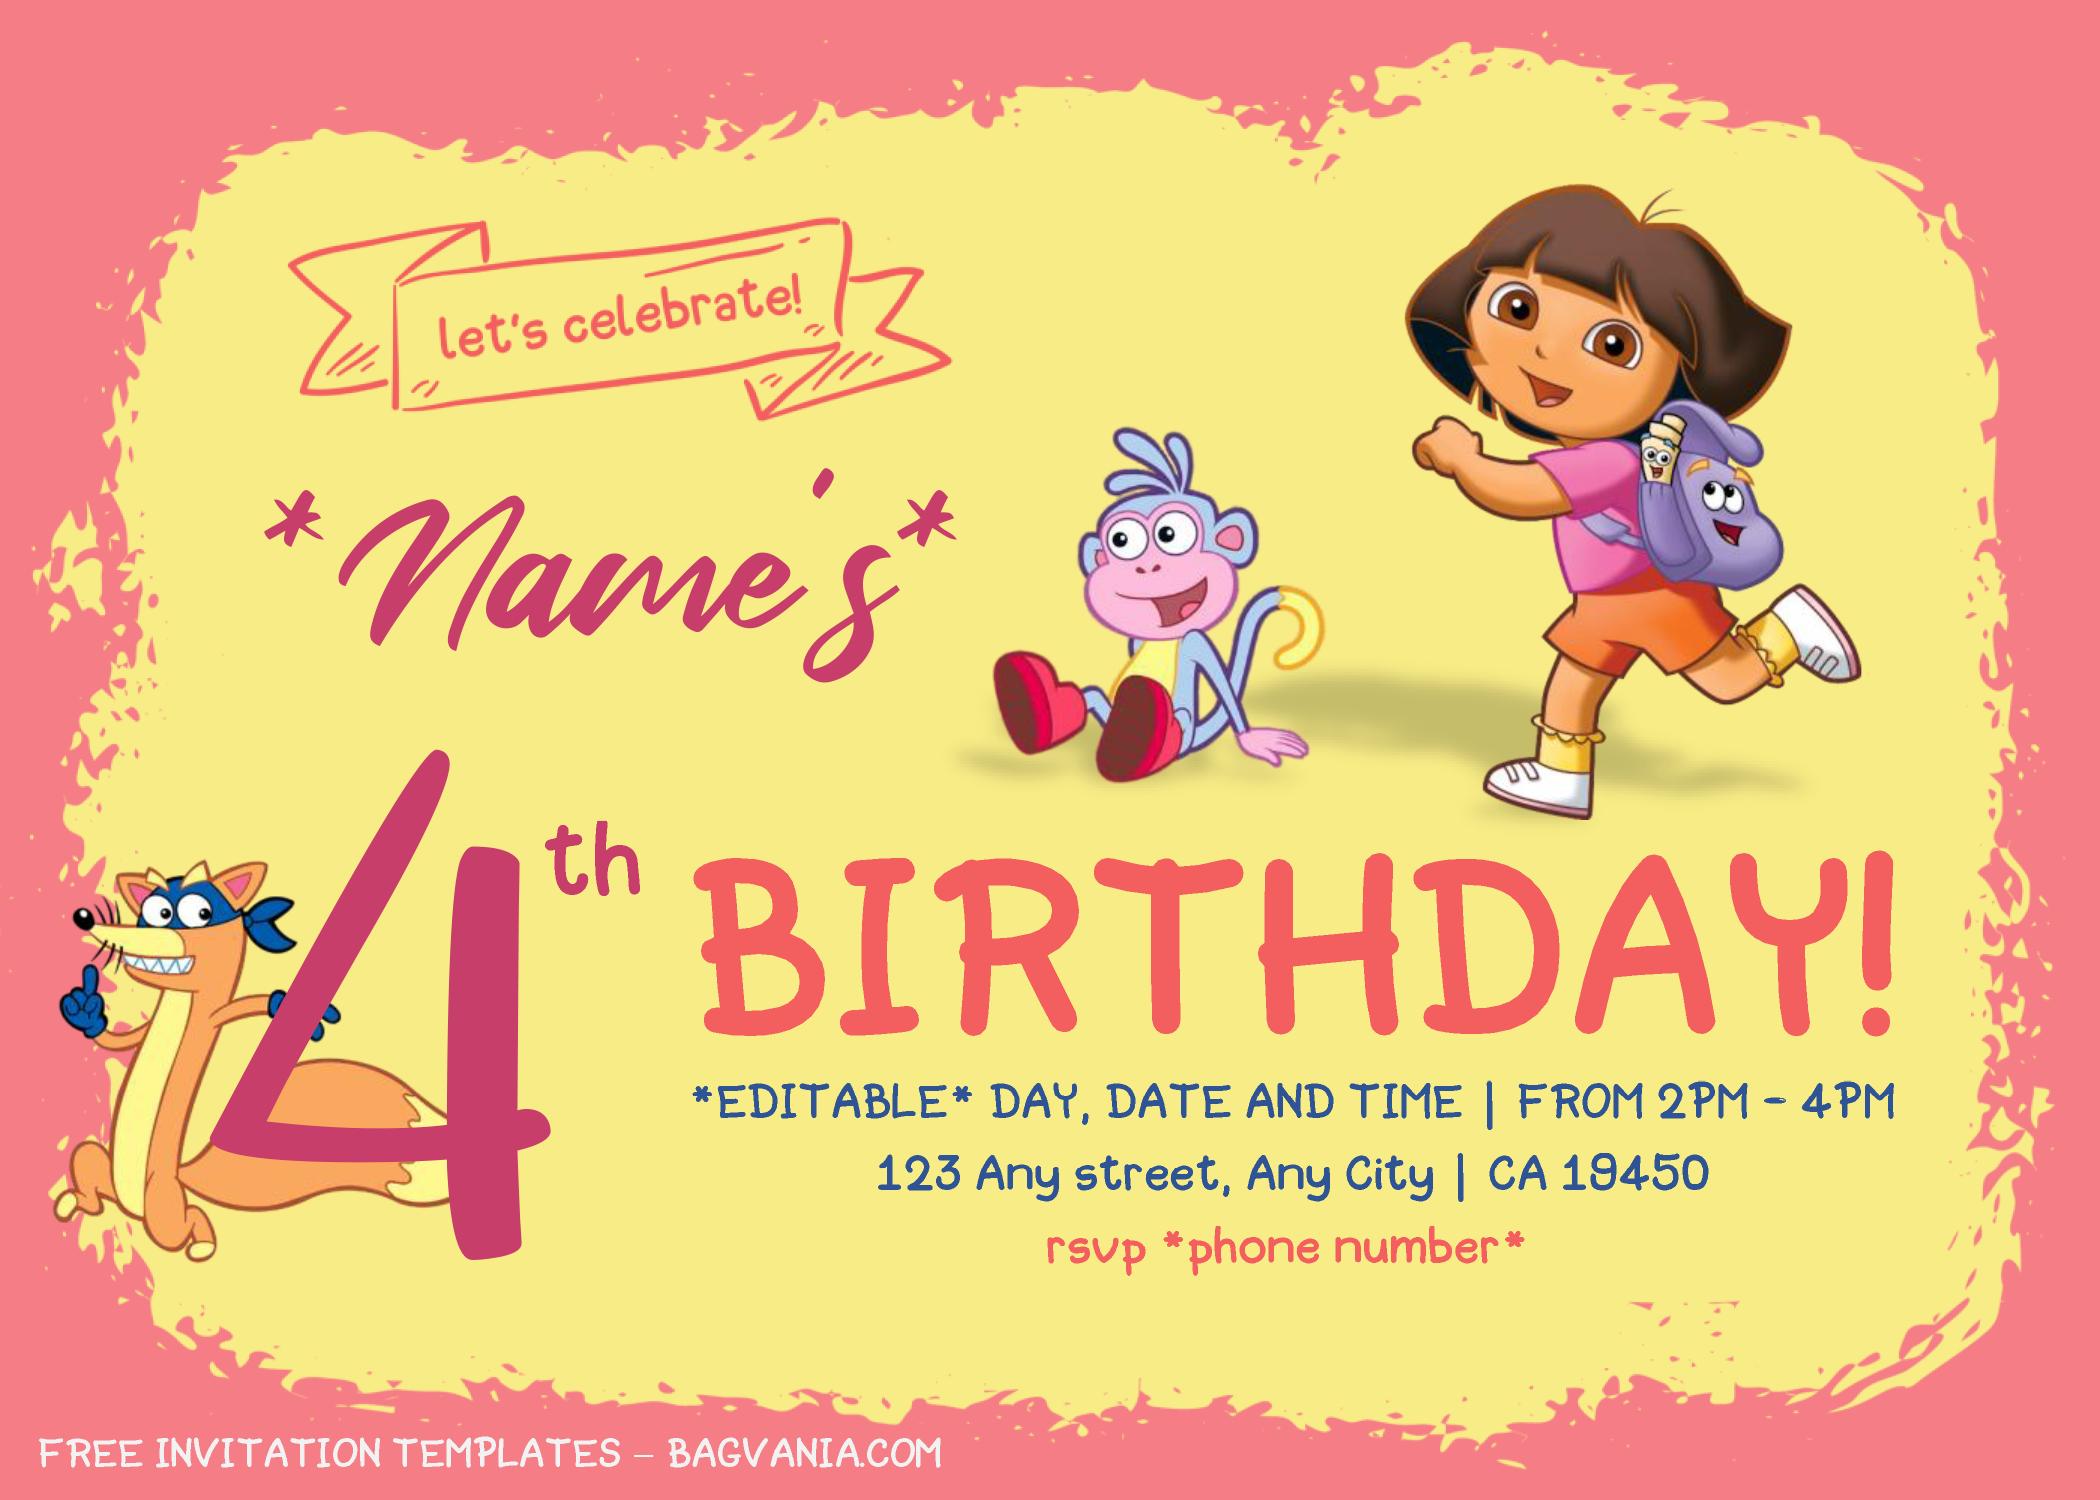 Dora The Explorer Birthday Invitation Templates Editab Birthday Invitation Templates Free Printable Invitations Templates Free Printable Birthday Invitations